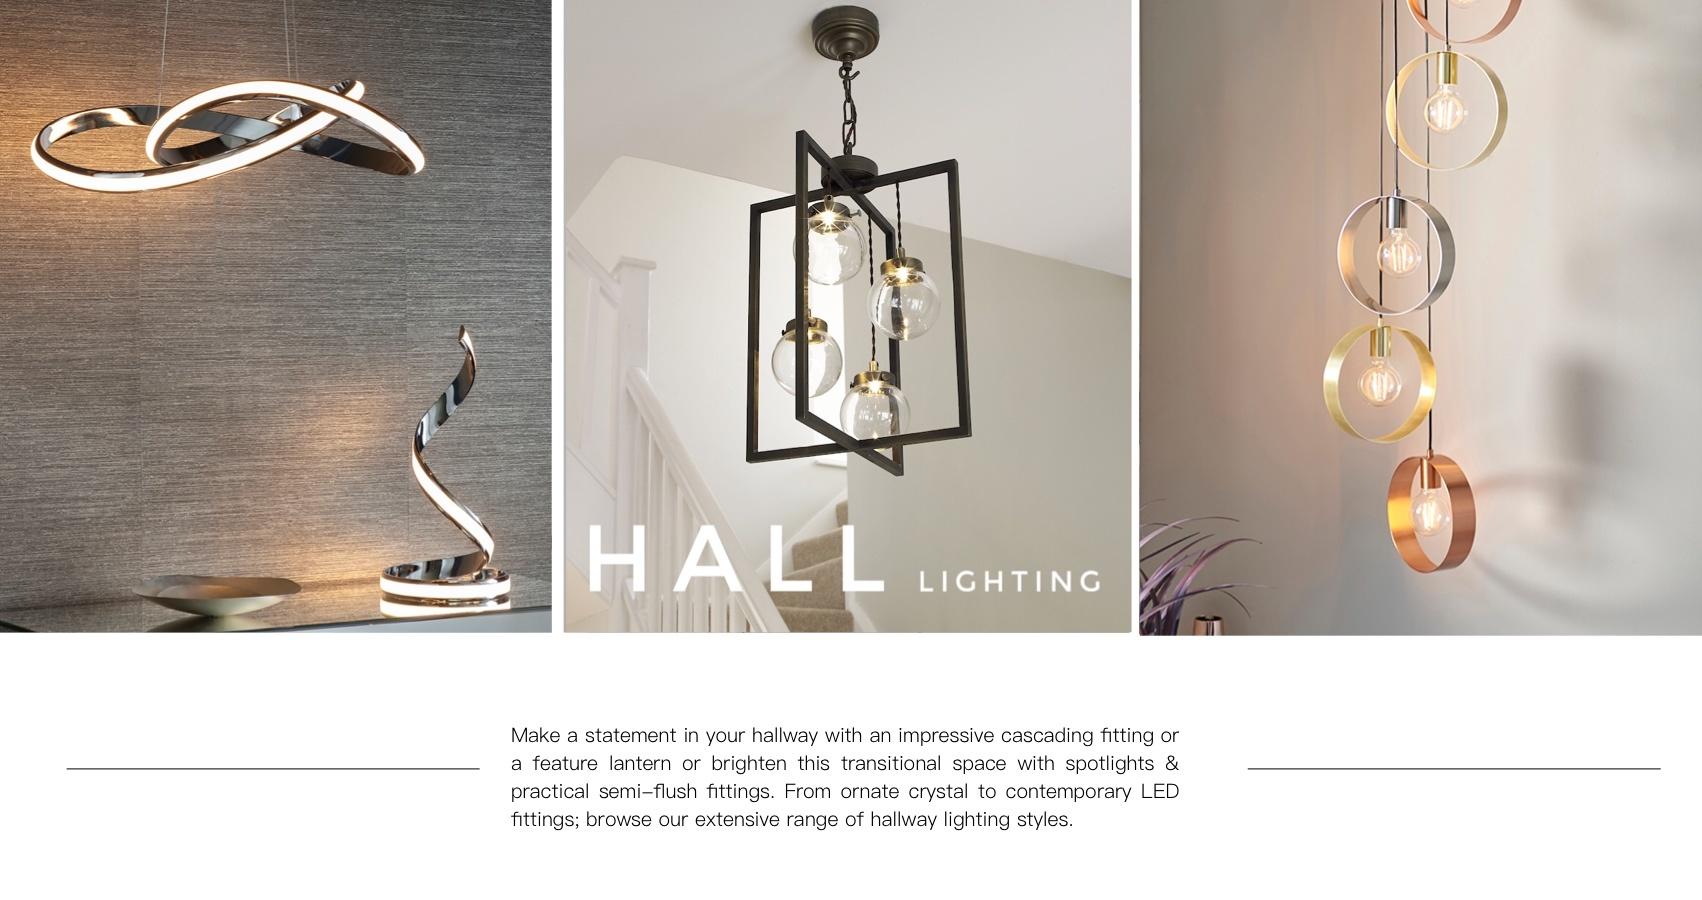 Hallway Lighting Lightbox